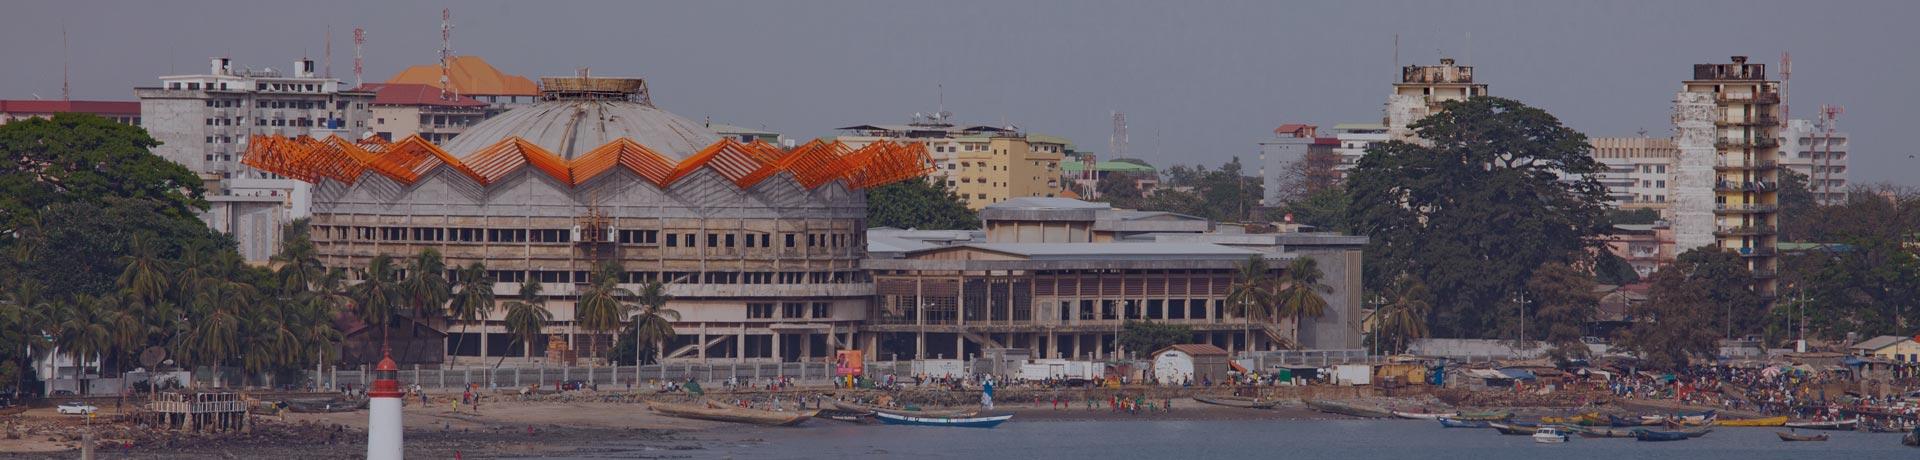 Guinea Conakry